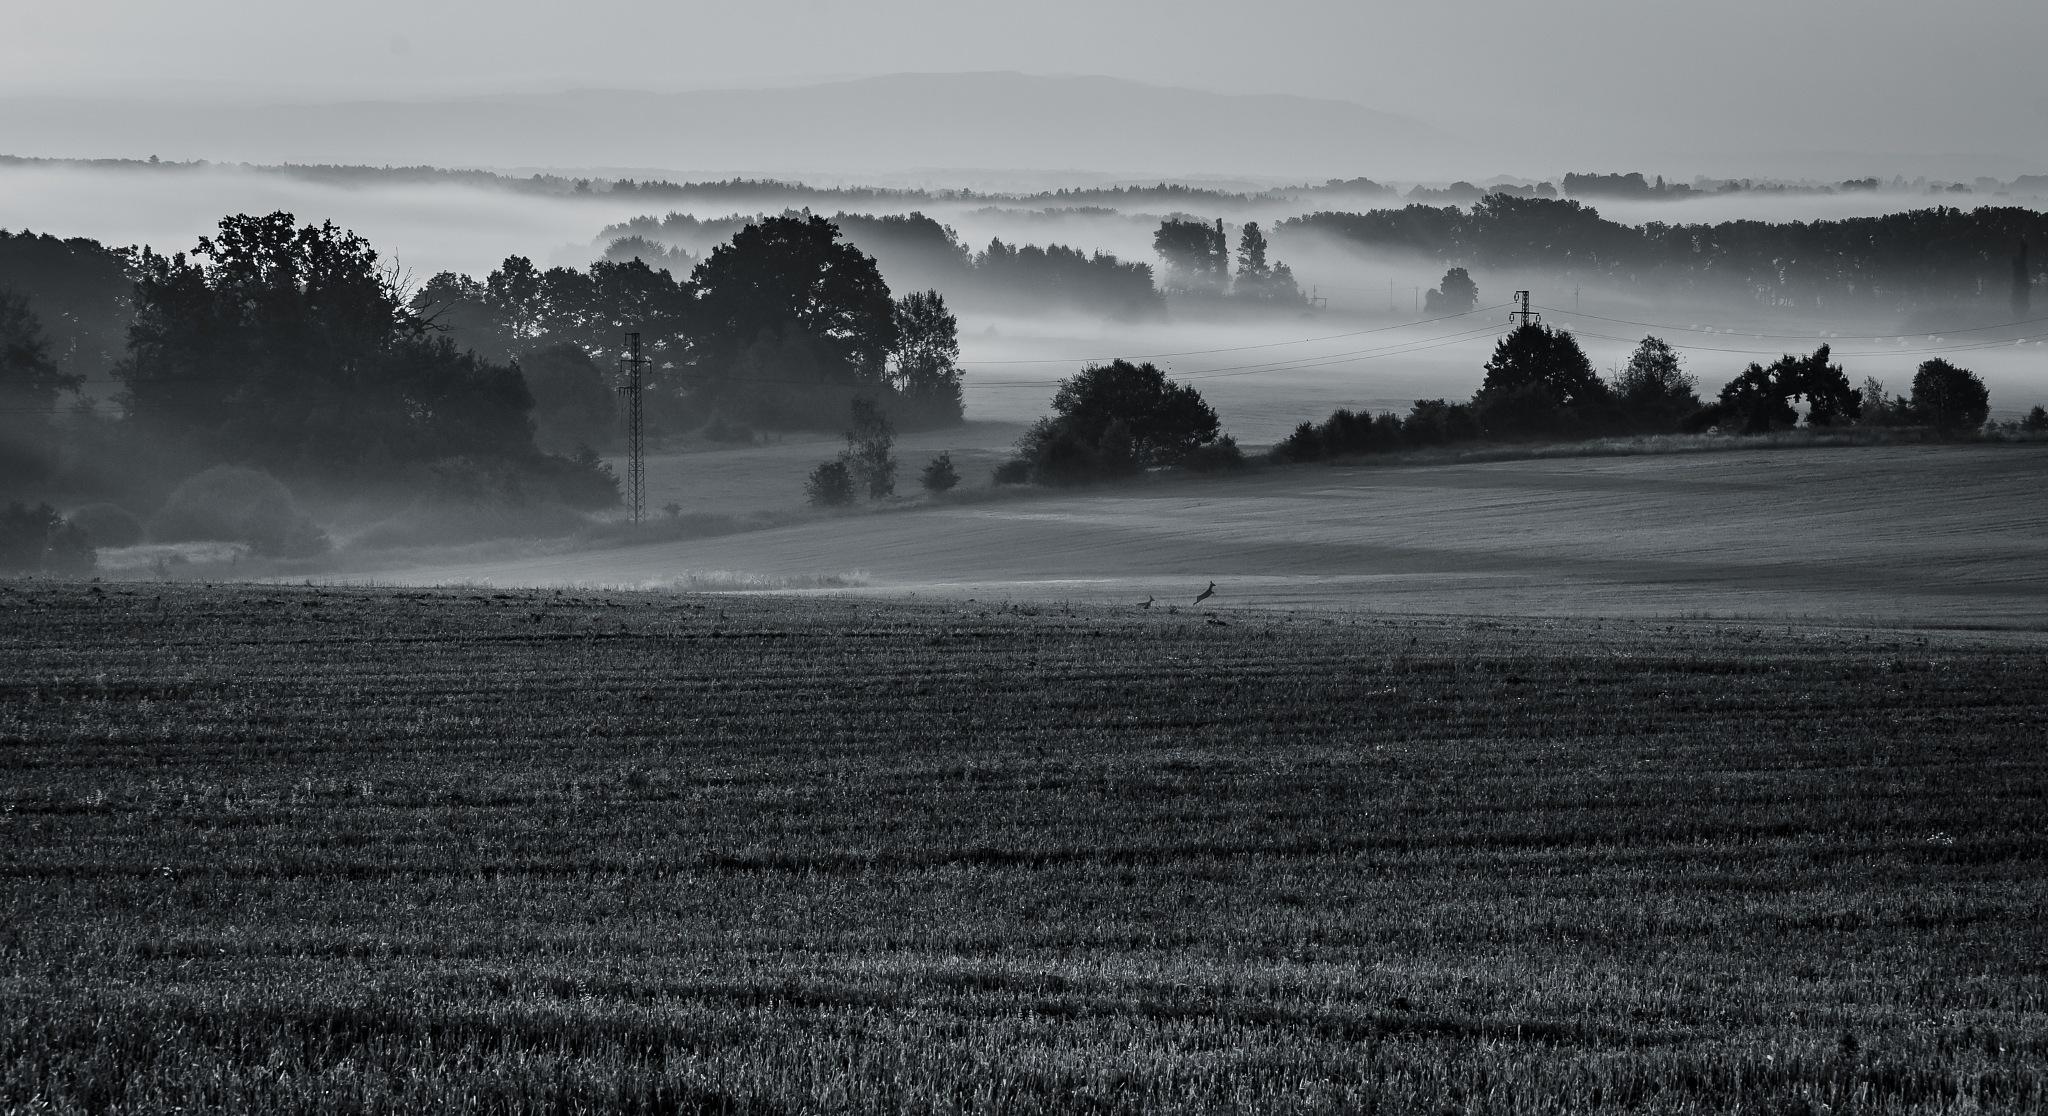 Morning joy of the roes by Miroslav Ondříšek